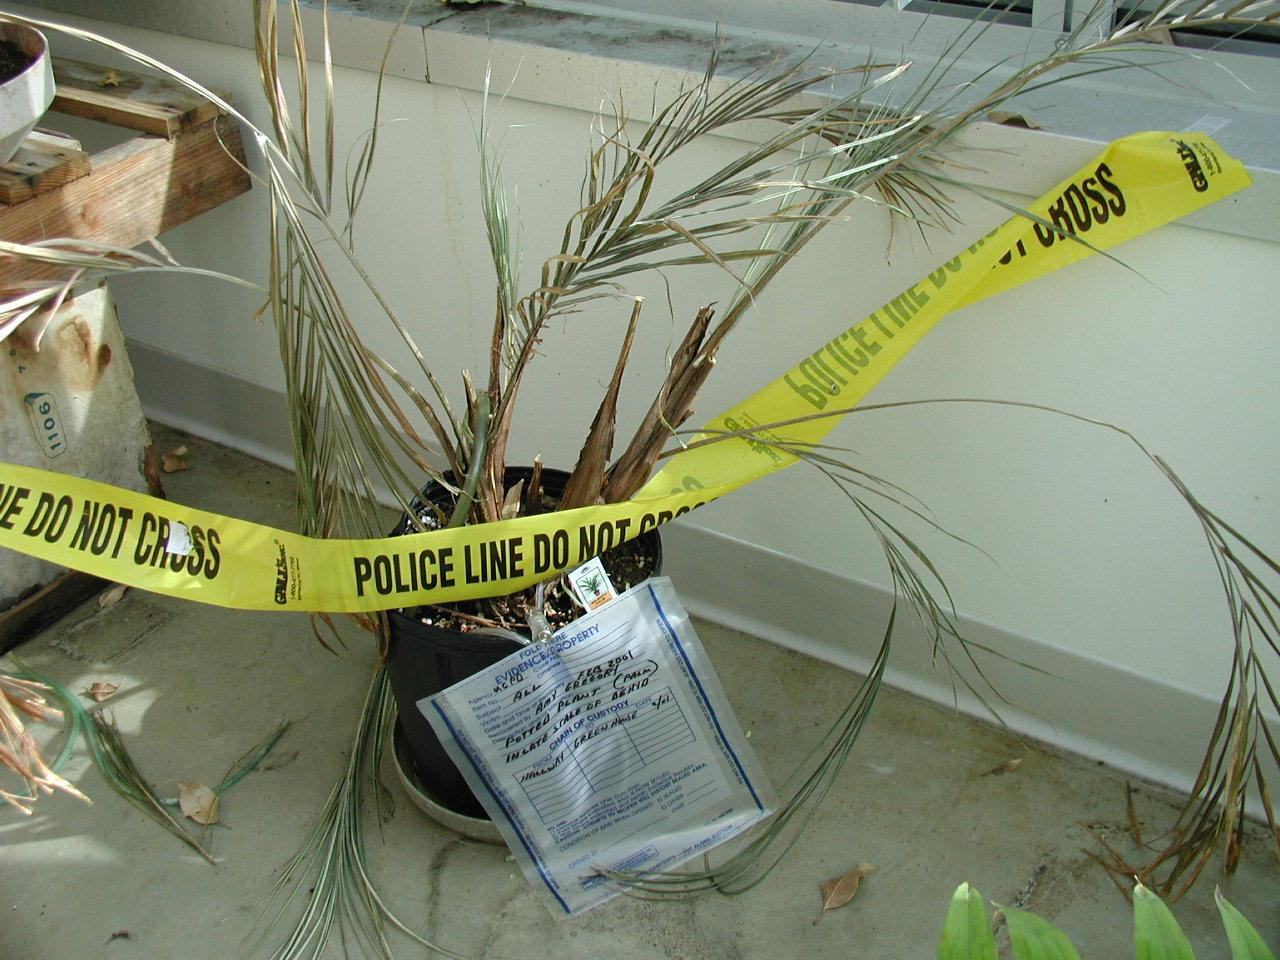 http://4.bp.blogspot.com/-N1TiWJonMQc/TdCRh5rmGDI/AAAAAAAABk8/1PExgbnH56Y/s1600/dead_plant_P2190004.jpg